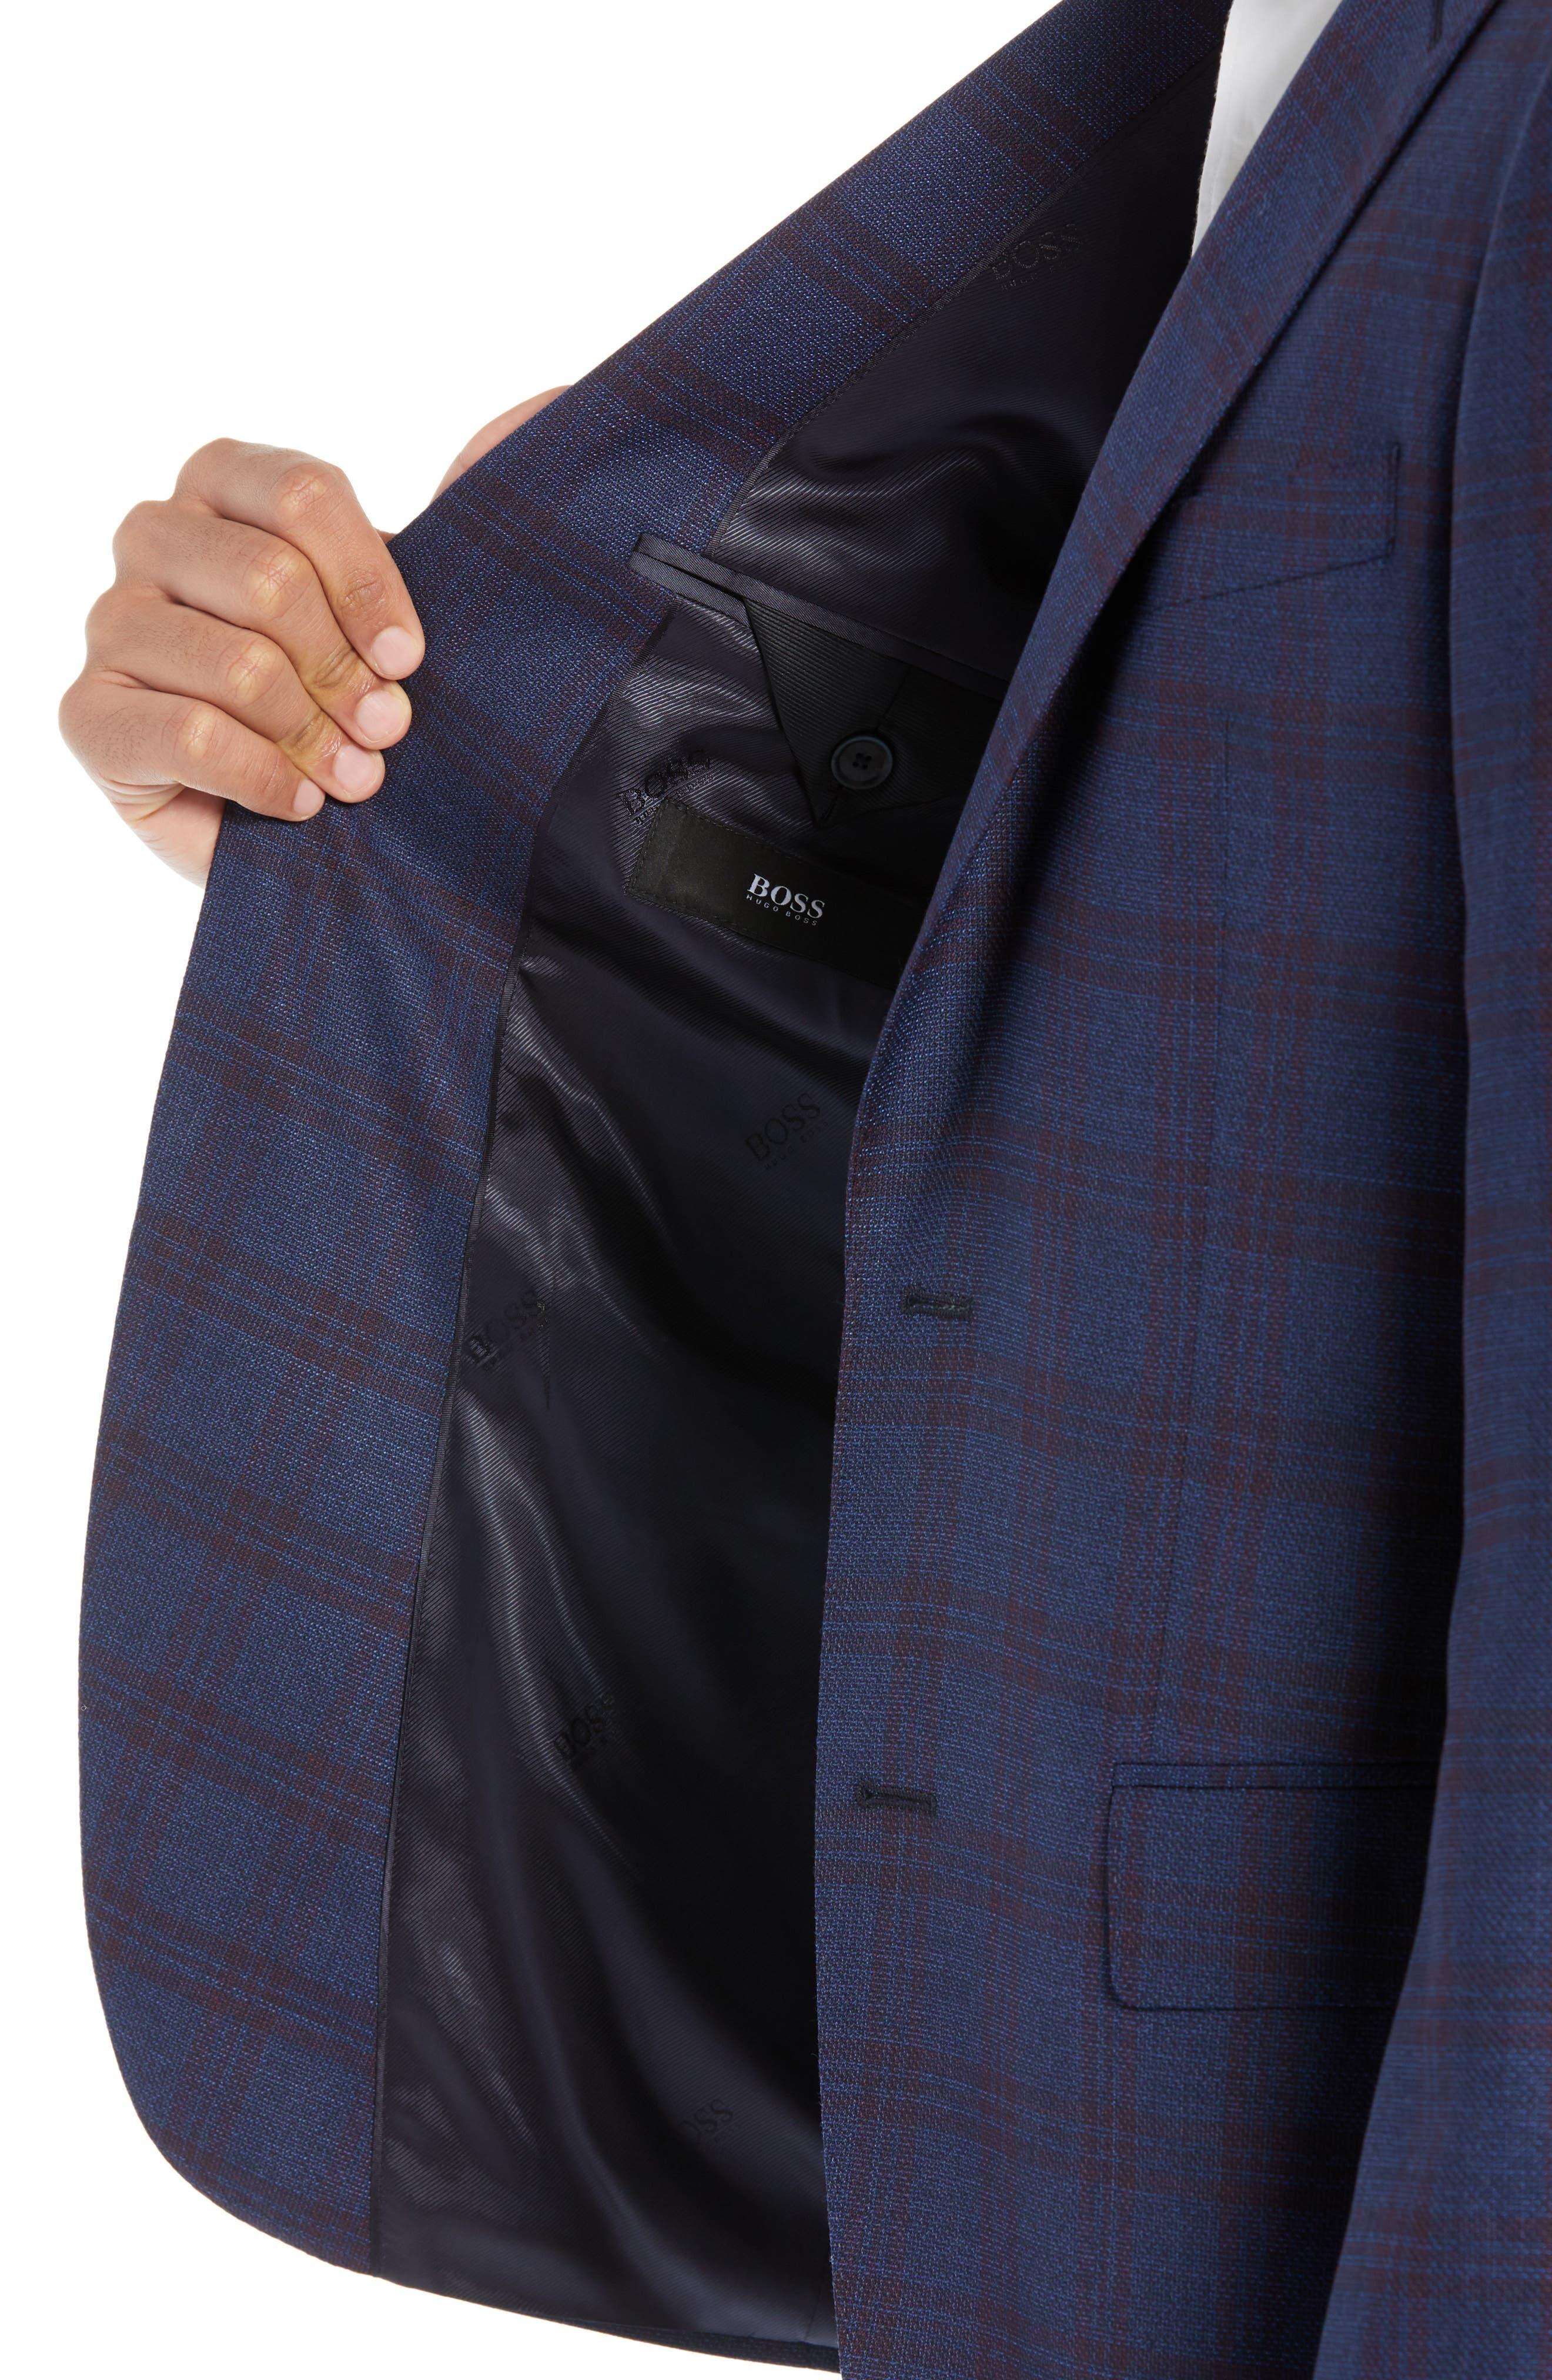 Jewels Classic Fit Plaid Wool Sport Coat,                             Alternate thumbnail 4, color,                             OPEN BLUE